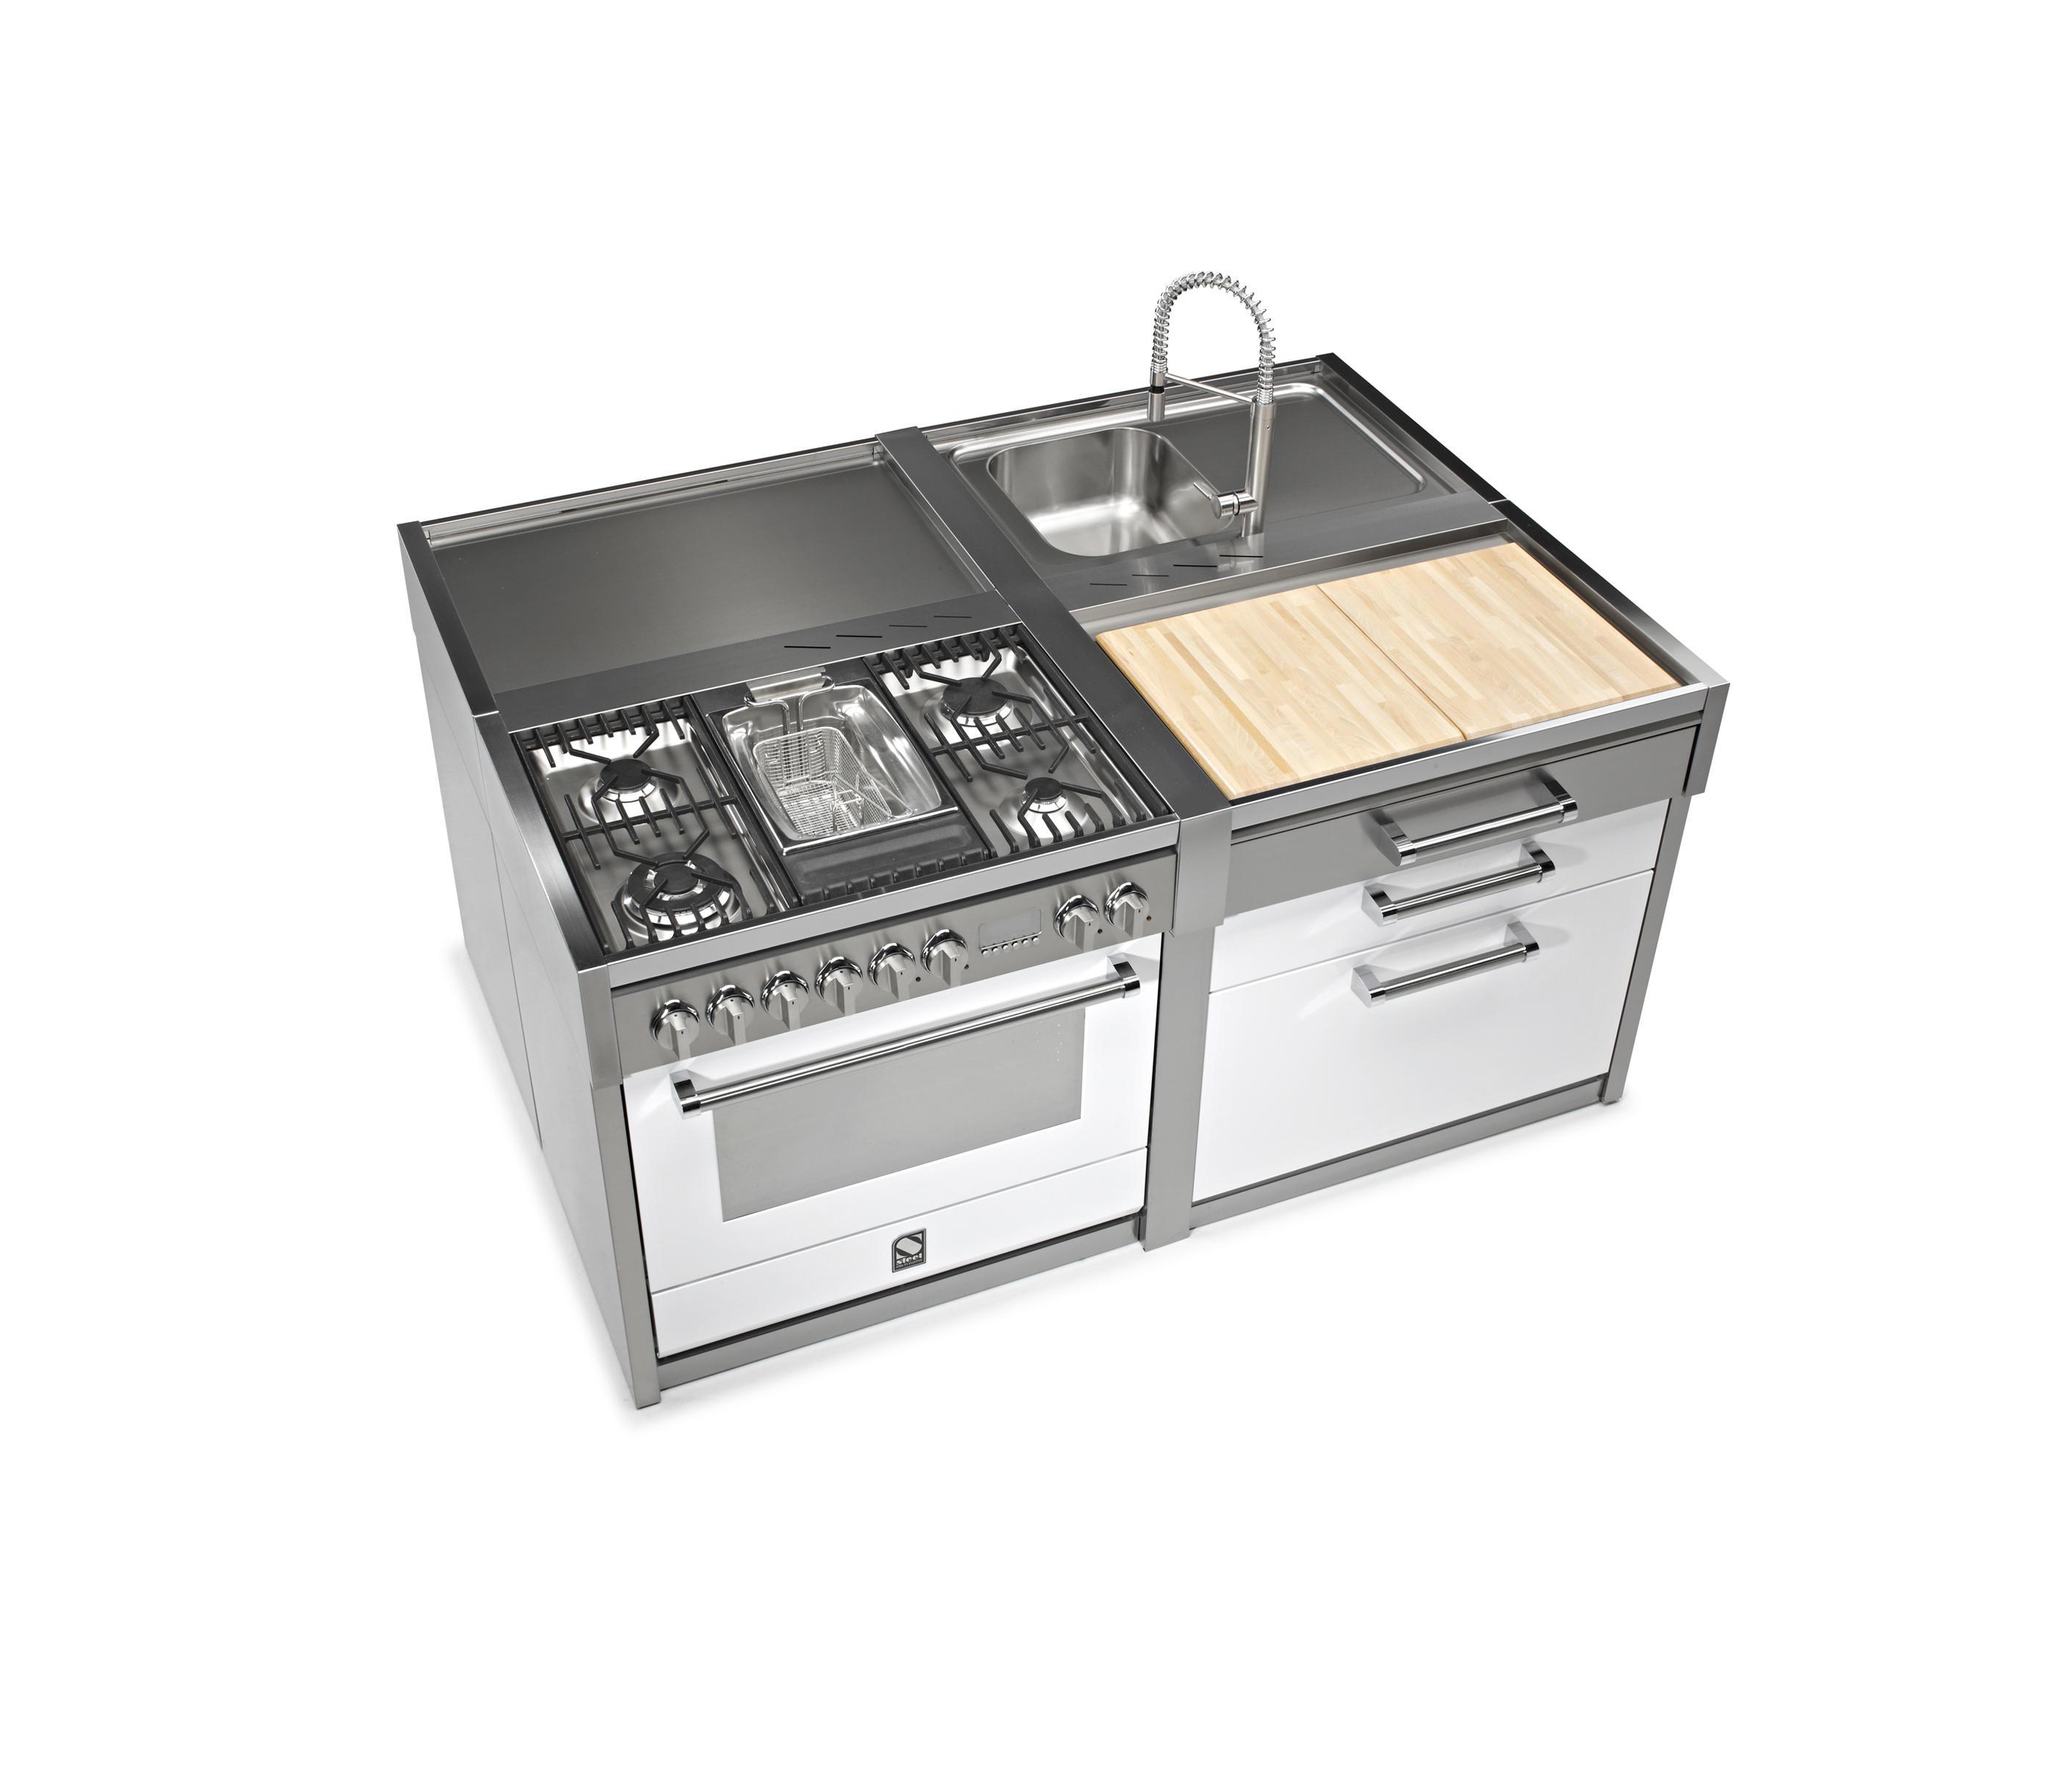 GENESI - DOUBLE BOWL SINK UNIT - Kitchen sinks from Steel | Architonic